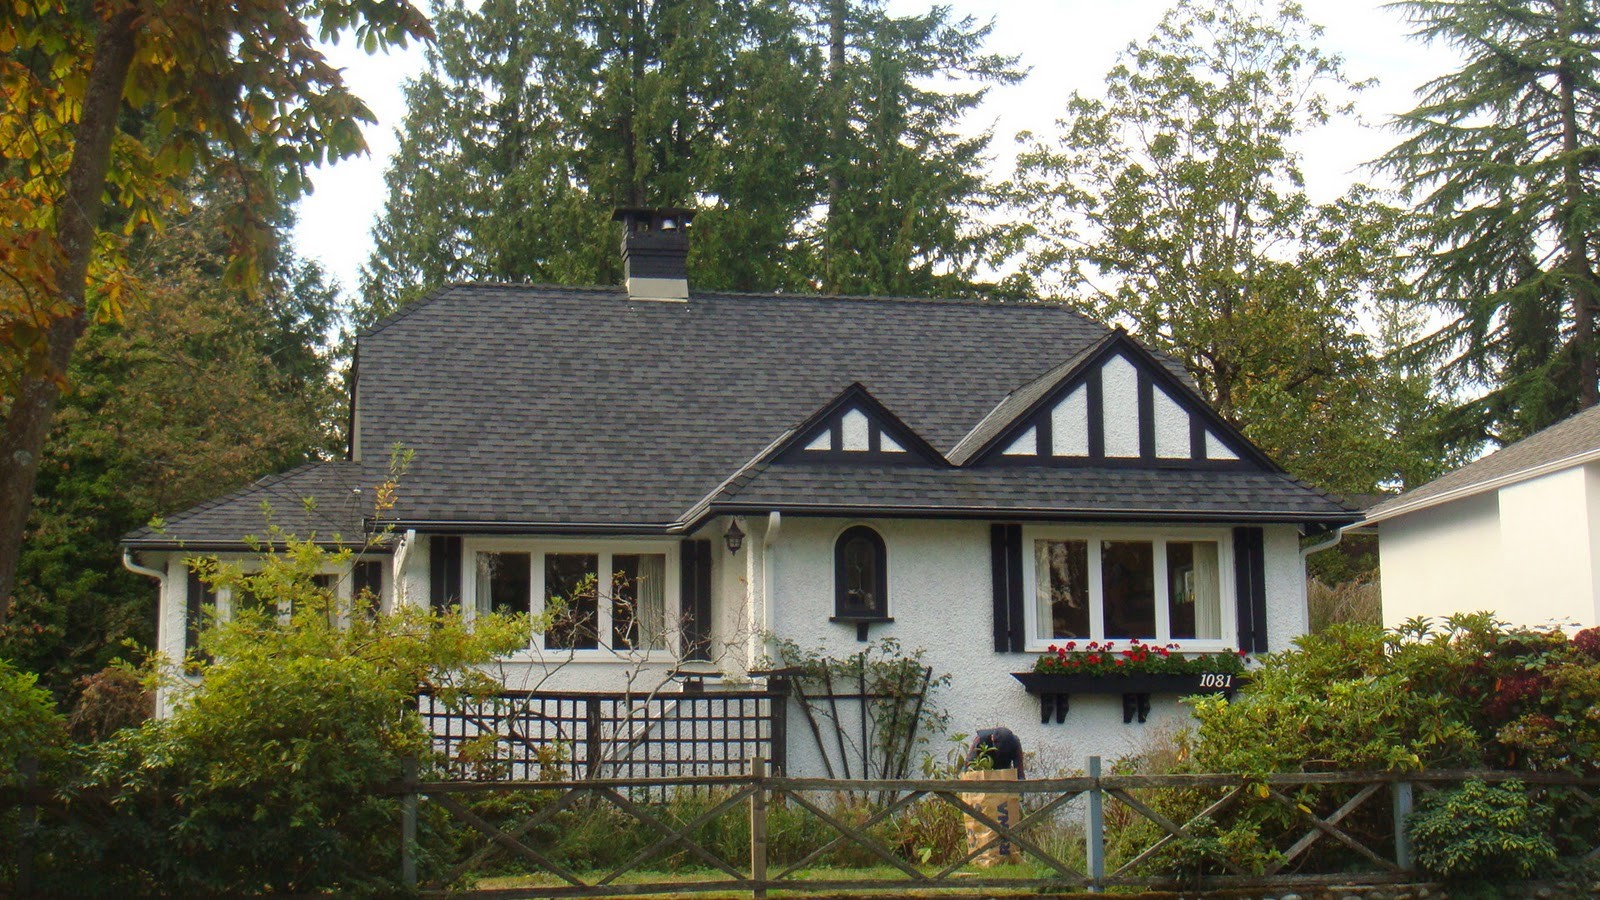 Pure Mix: Tudor style houses